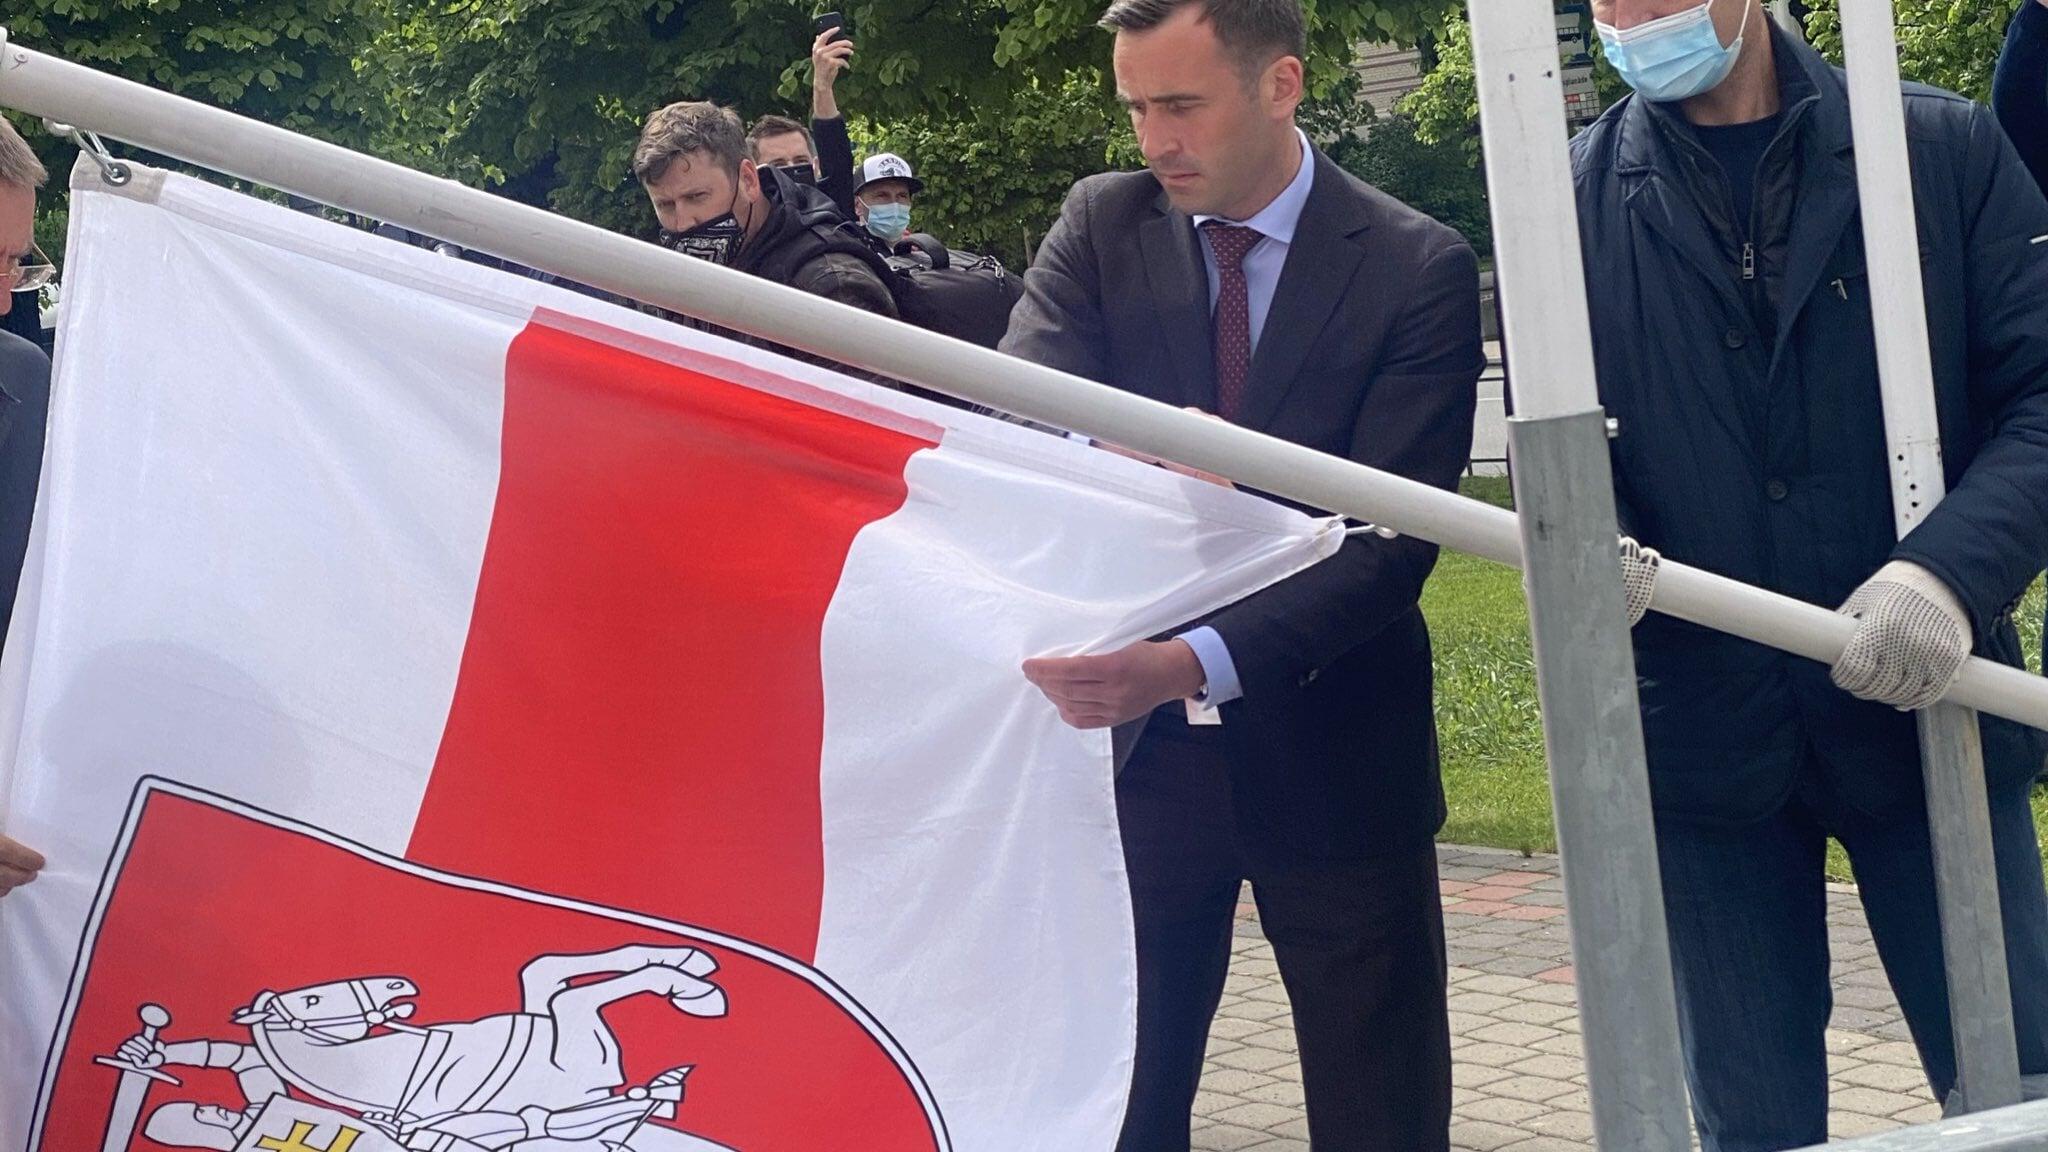 Мэр Риги заменил флаг Беларуси на бело-красно-белый: Флаг, символизирующий режим государственного терроризма, неуместен в городе